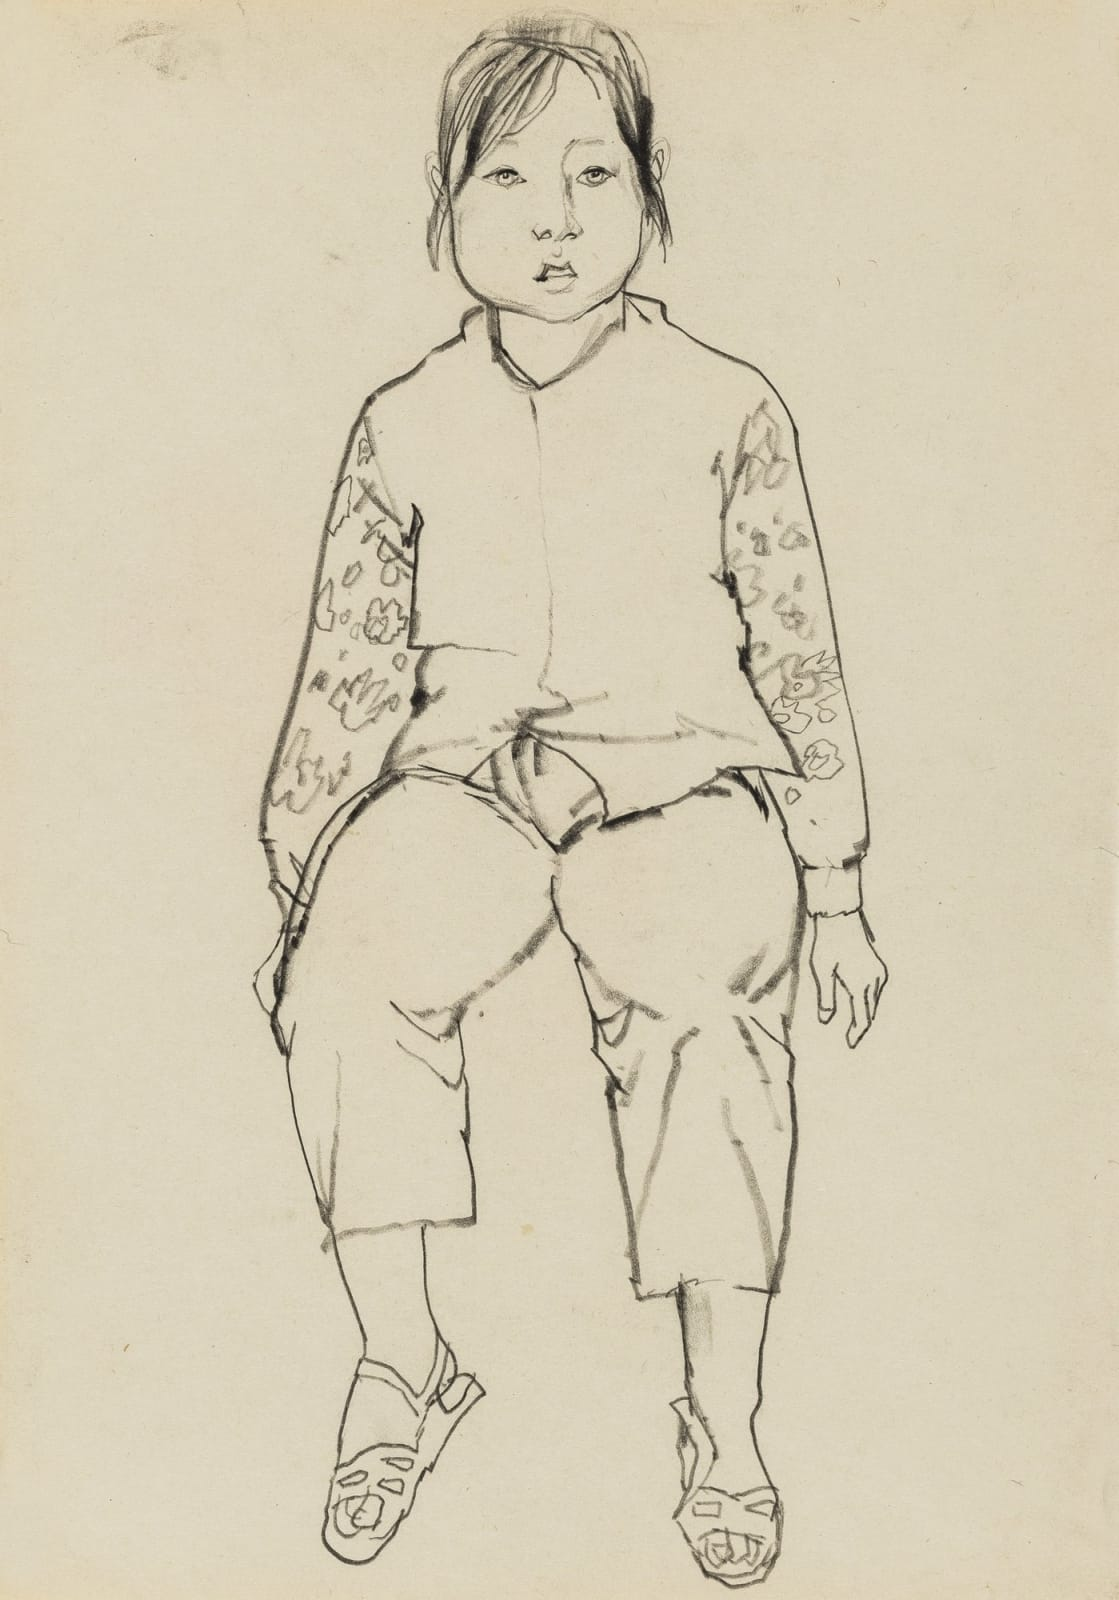 Li Jin 李津, Study of a Girl in Sandals 速写练习:穿凉鞋的女孩, 1981